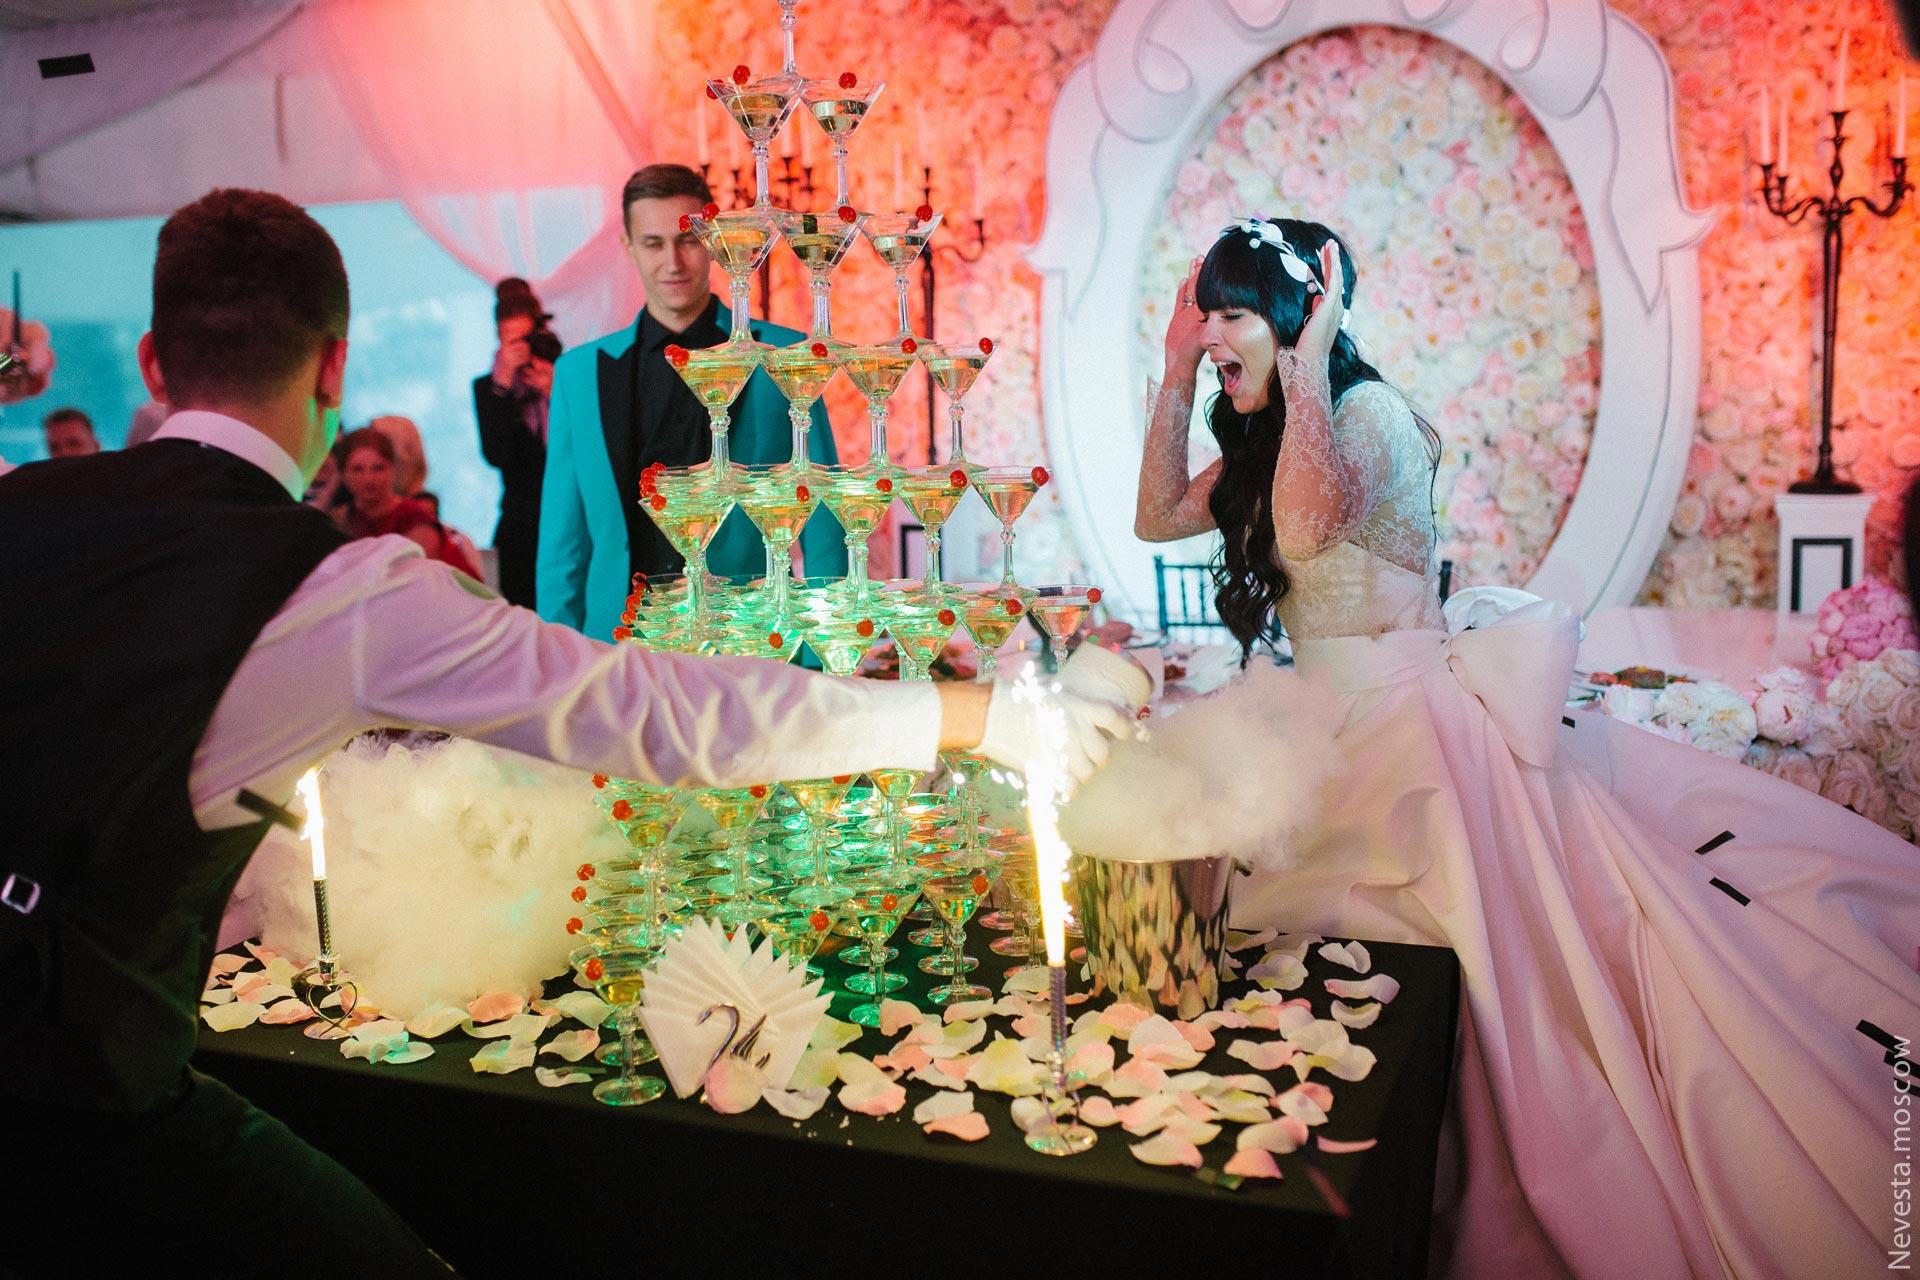 Свадьба Нелли Ермолаевой и Кирилла Андреева фото 37